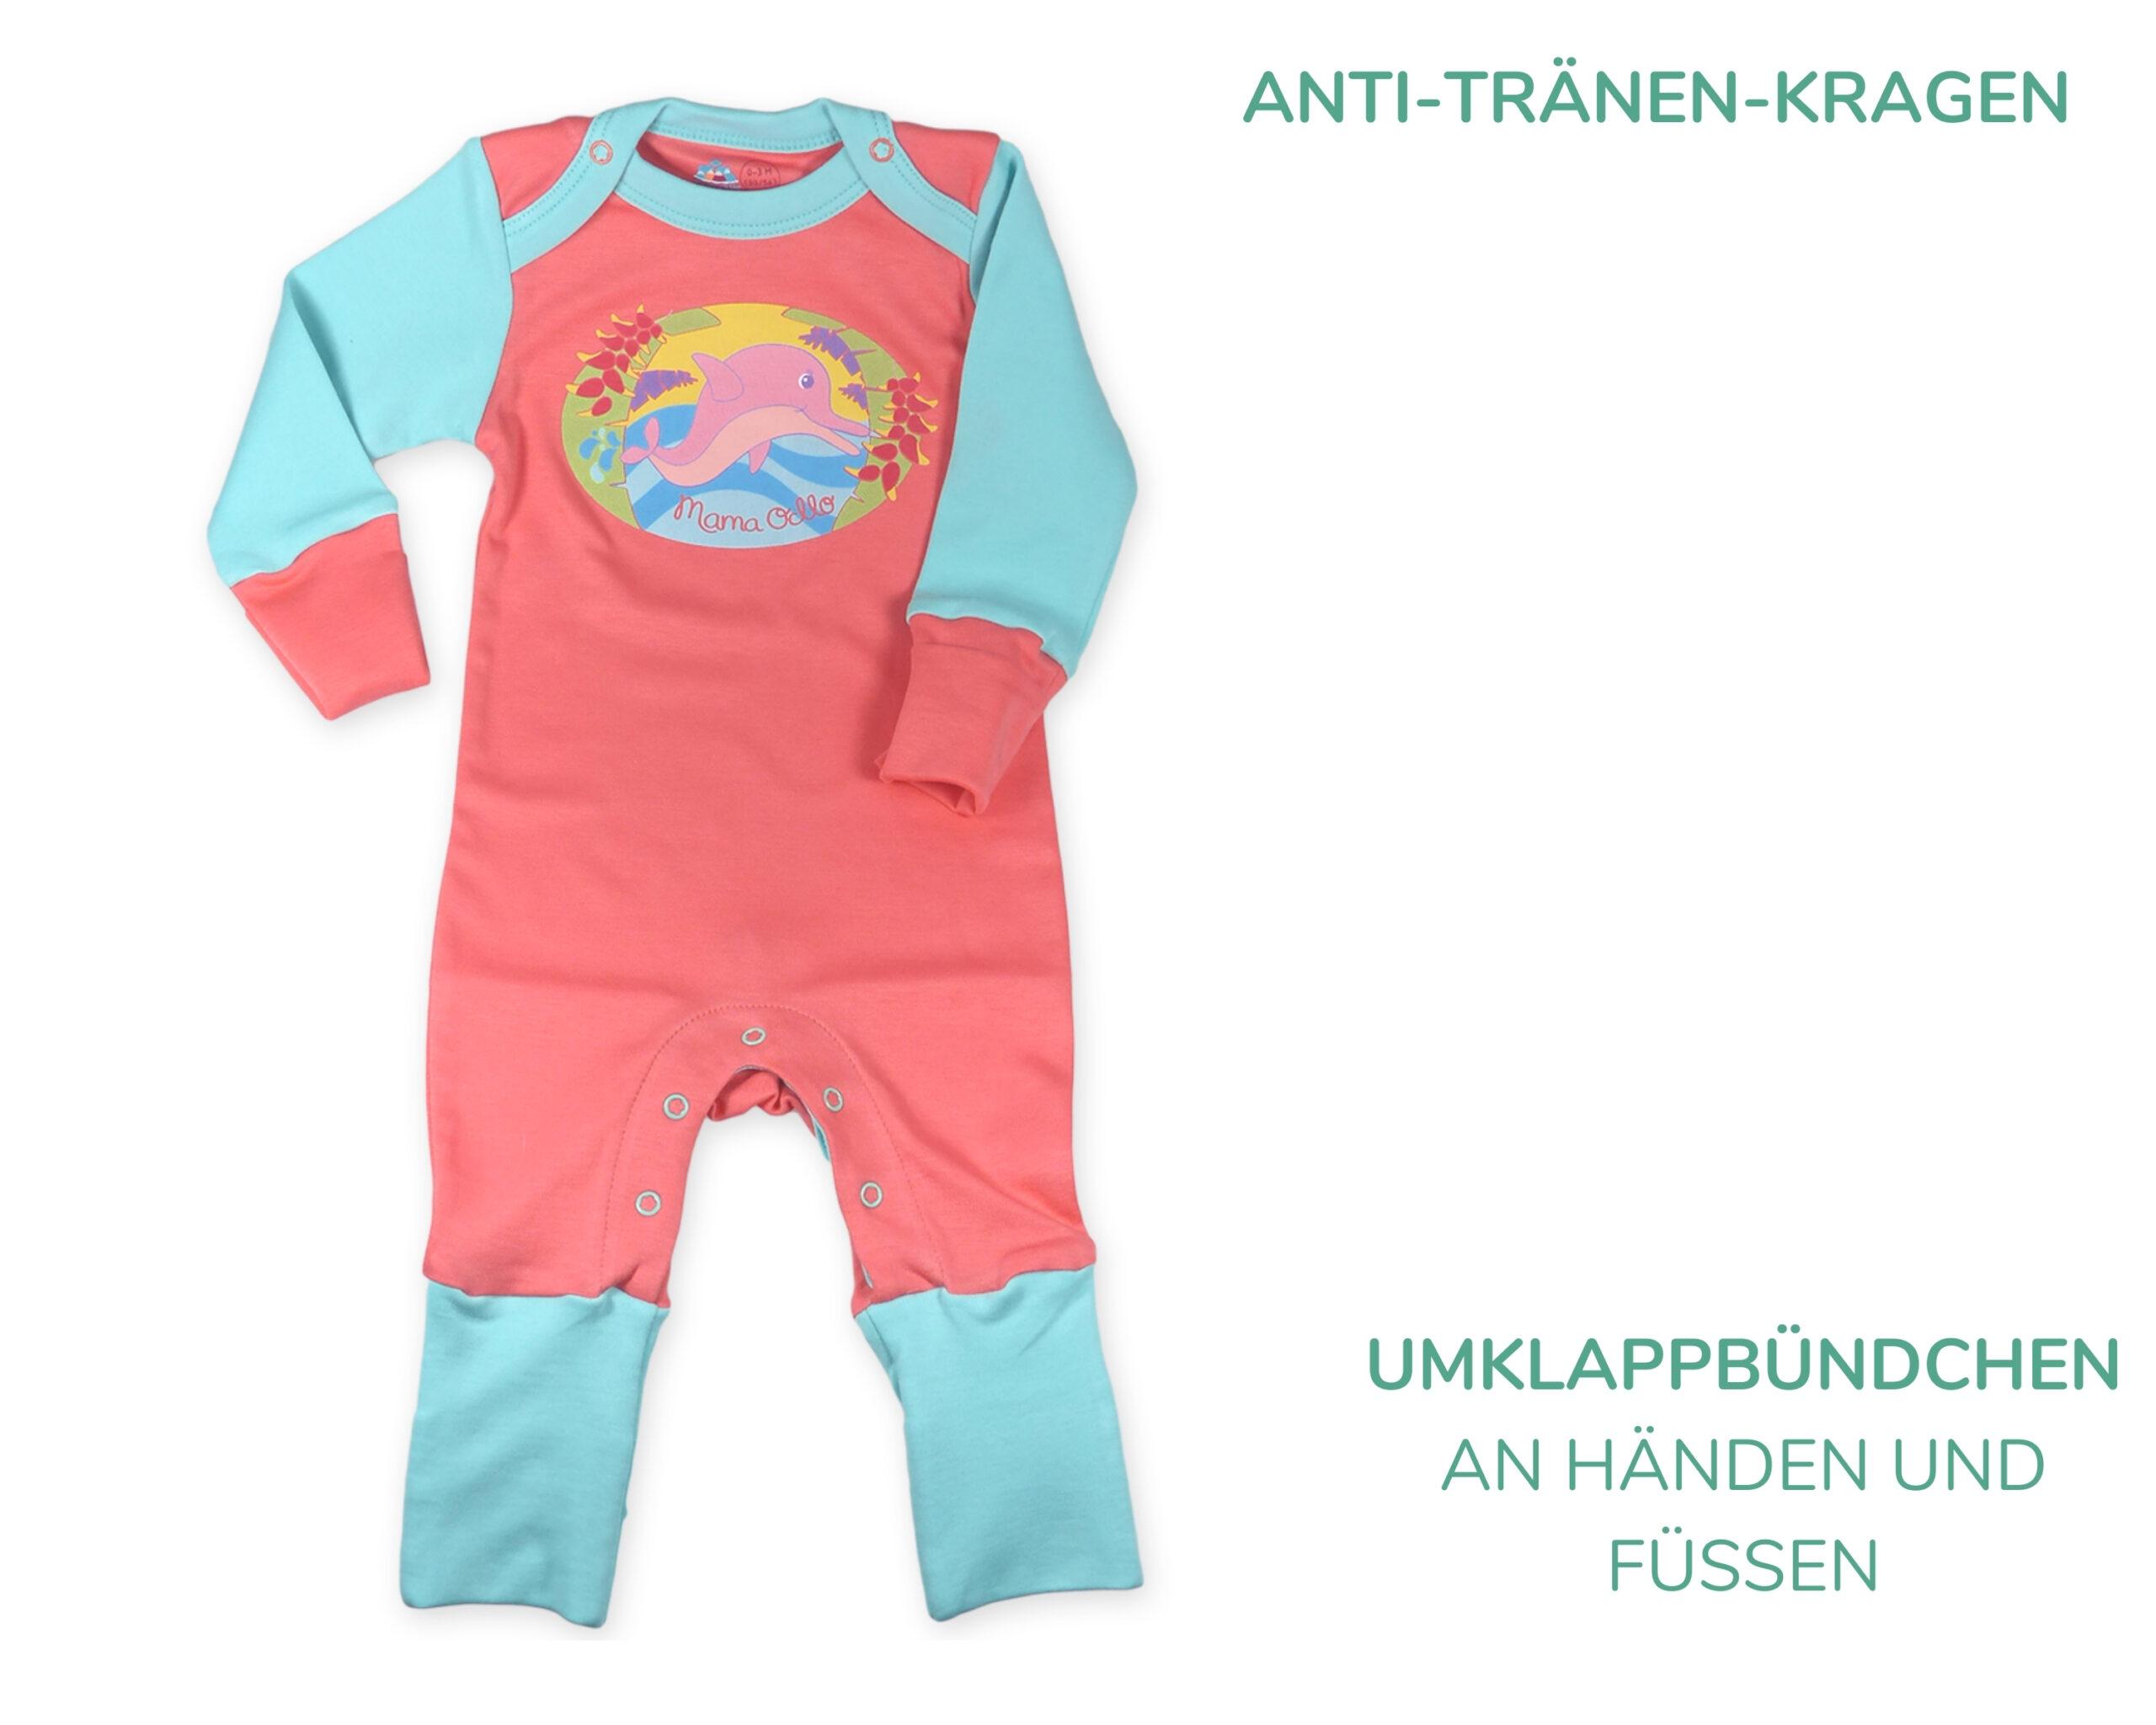 Neugeborenes im Sommer: lange Kleidung bei 30 °C?